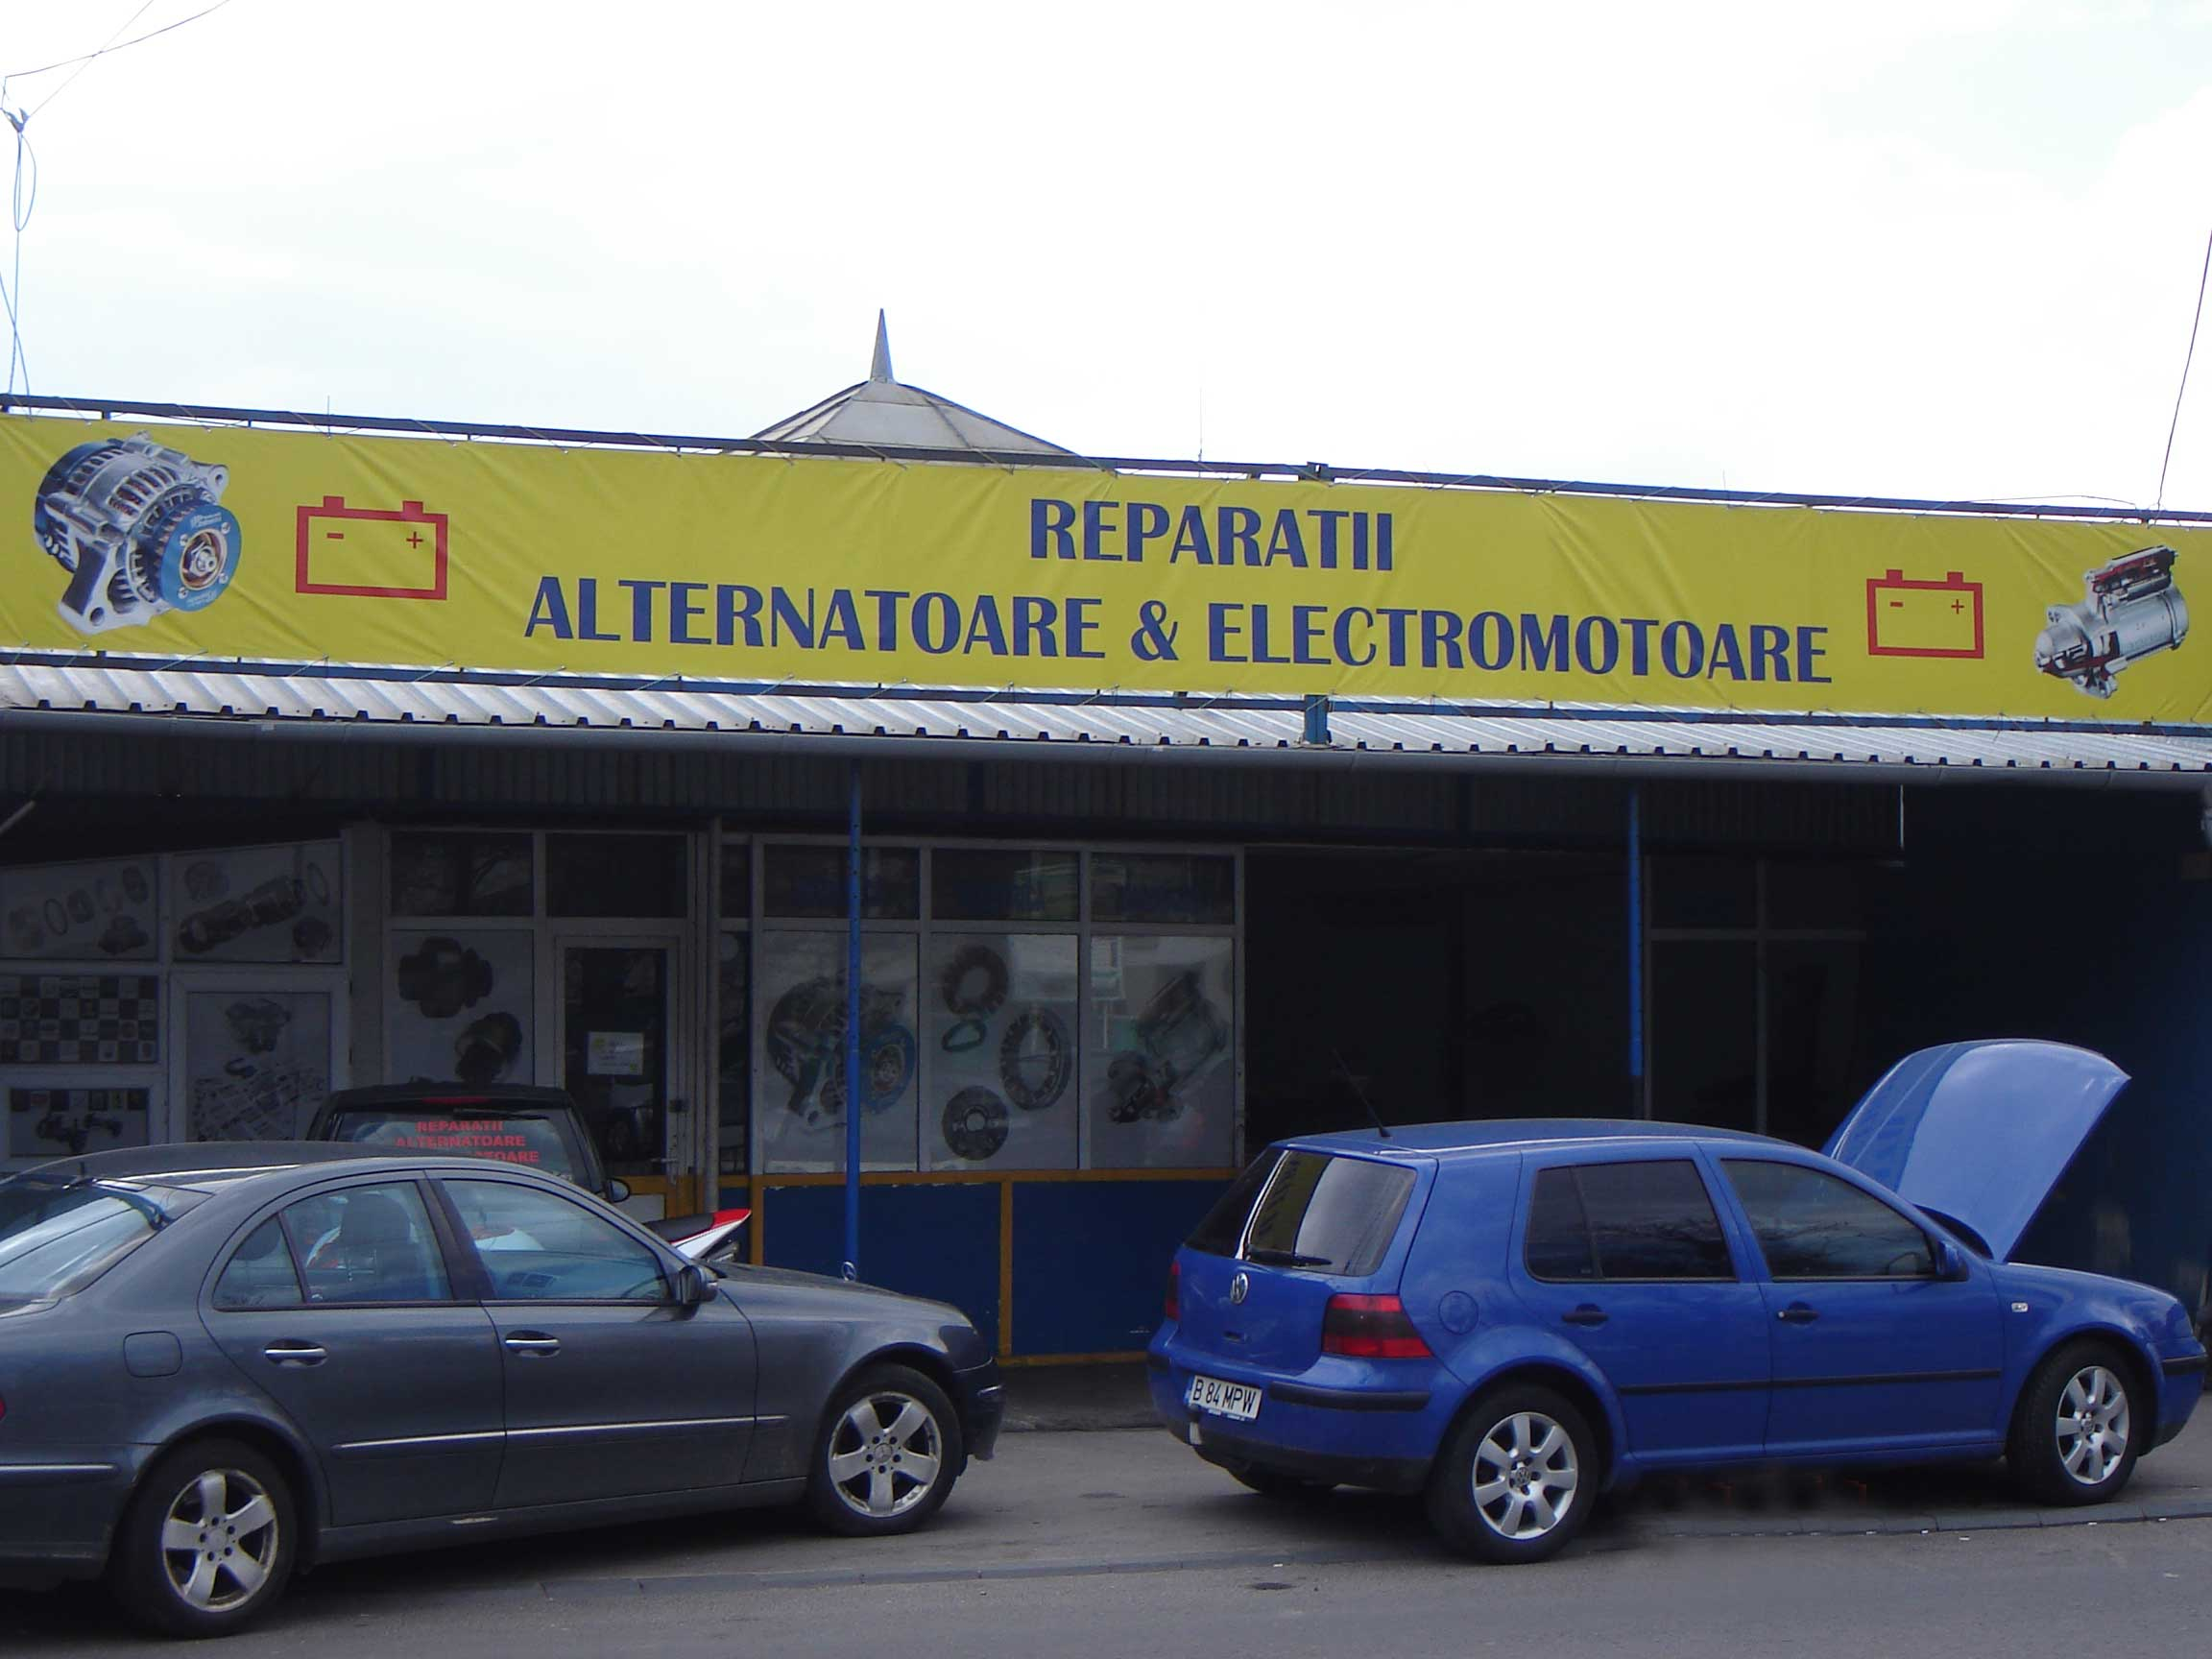 service reparatii alternatoare